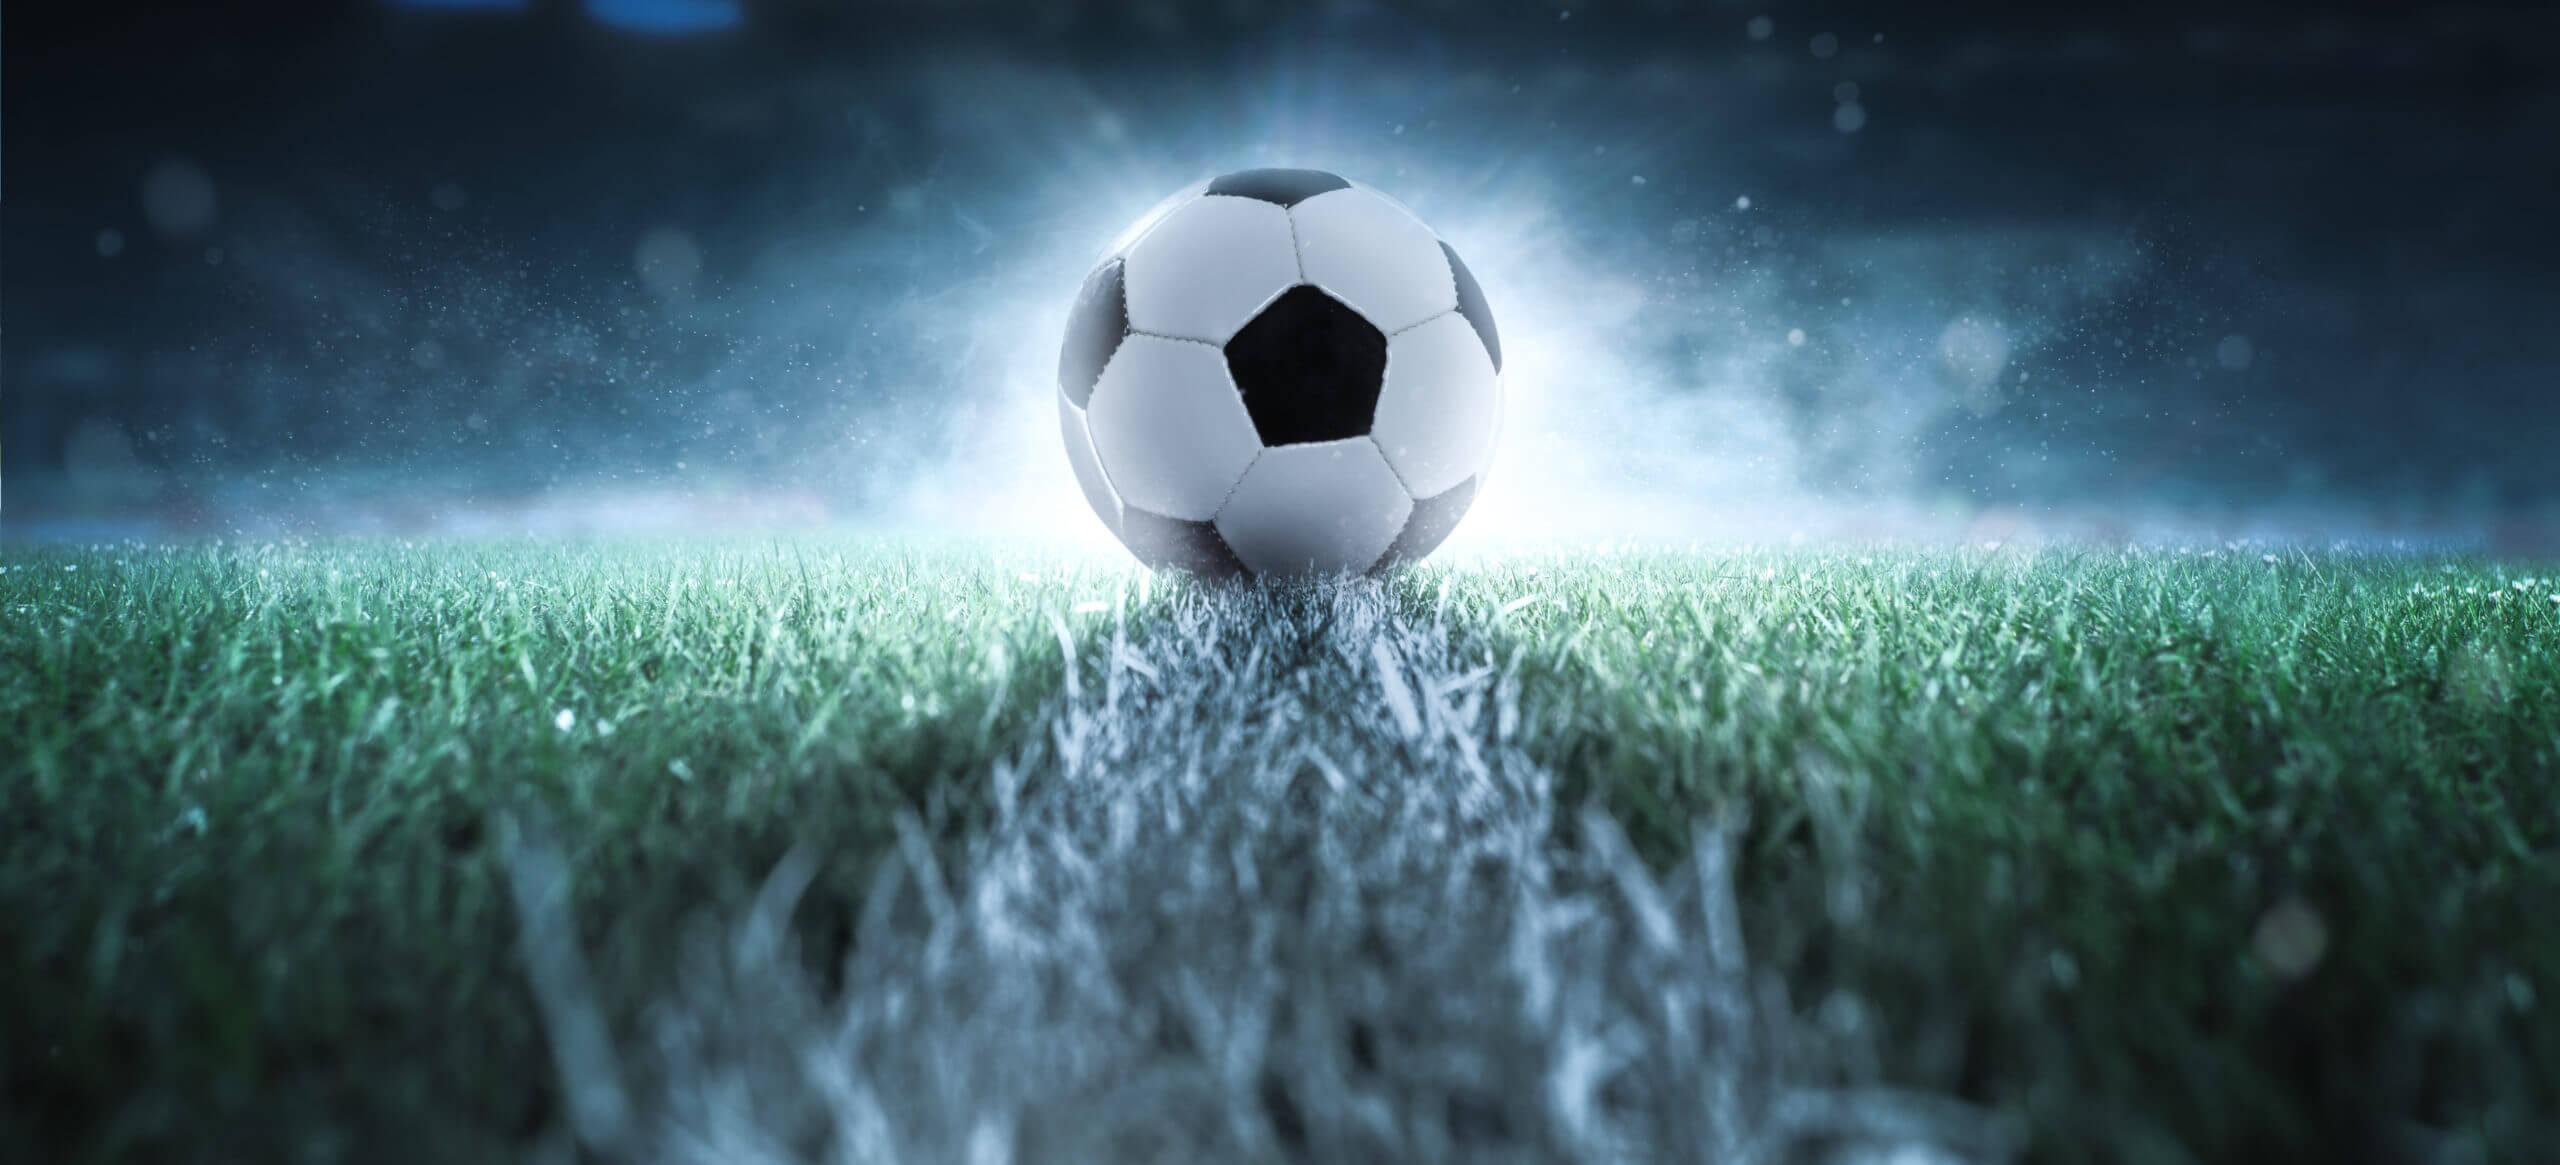 Opprykksfinale i Championship er mellom Brentford og Fulham